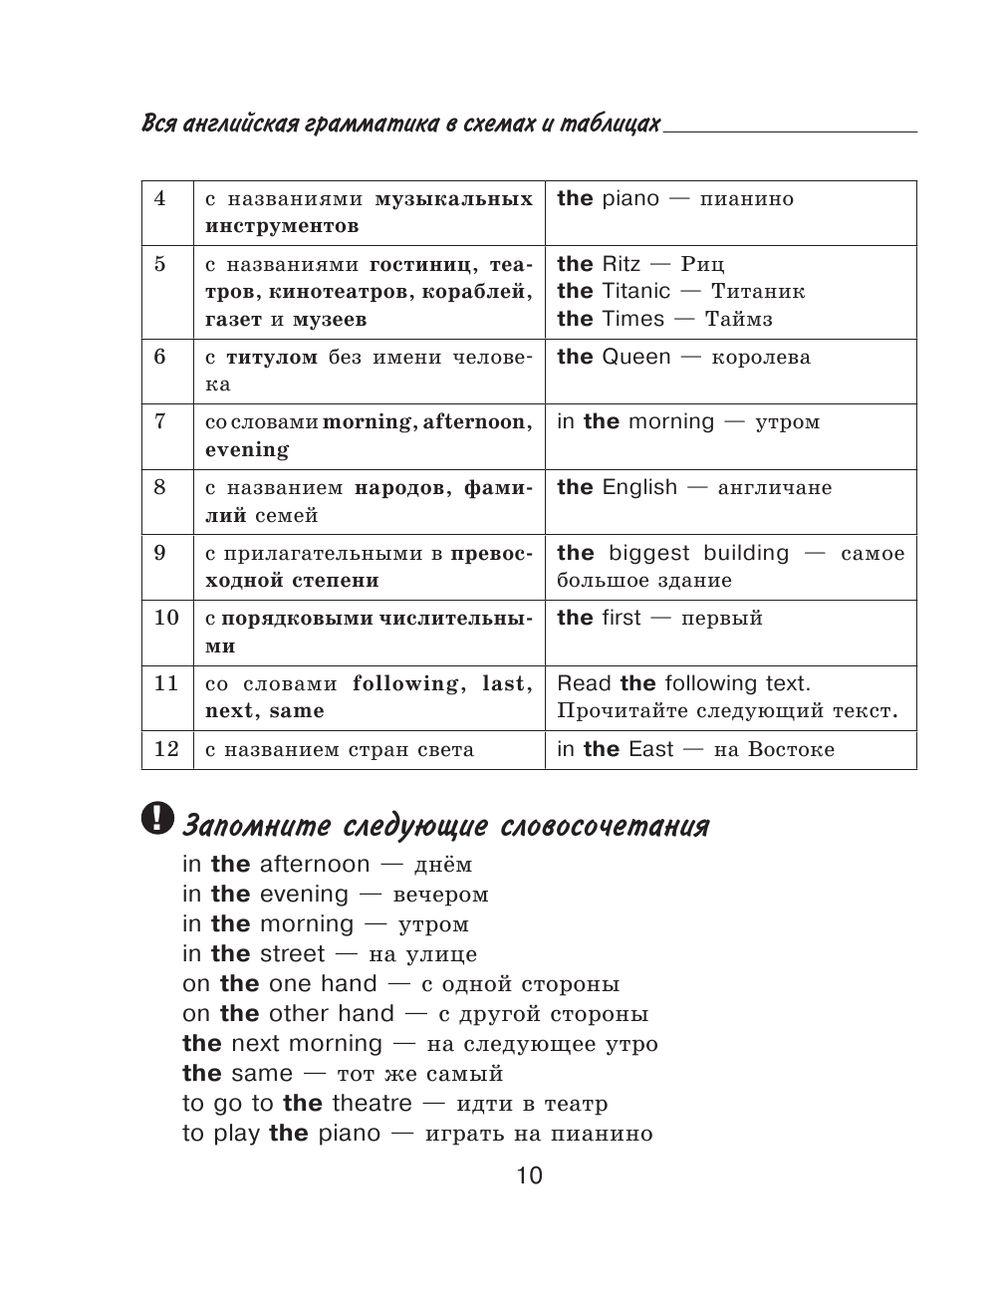 Английская грамматика в схемах и таблицах фото 406